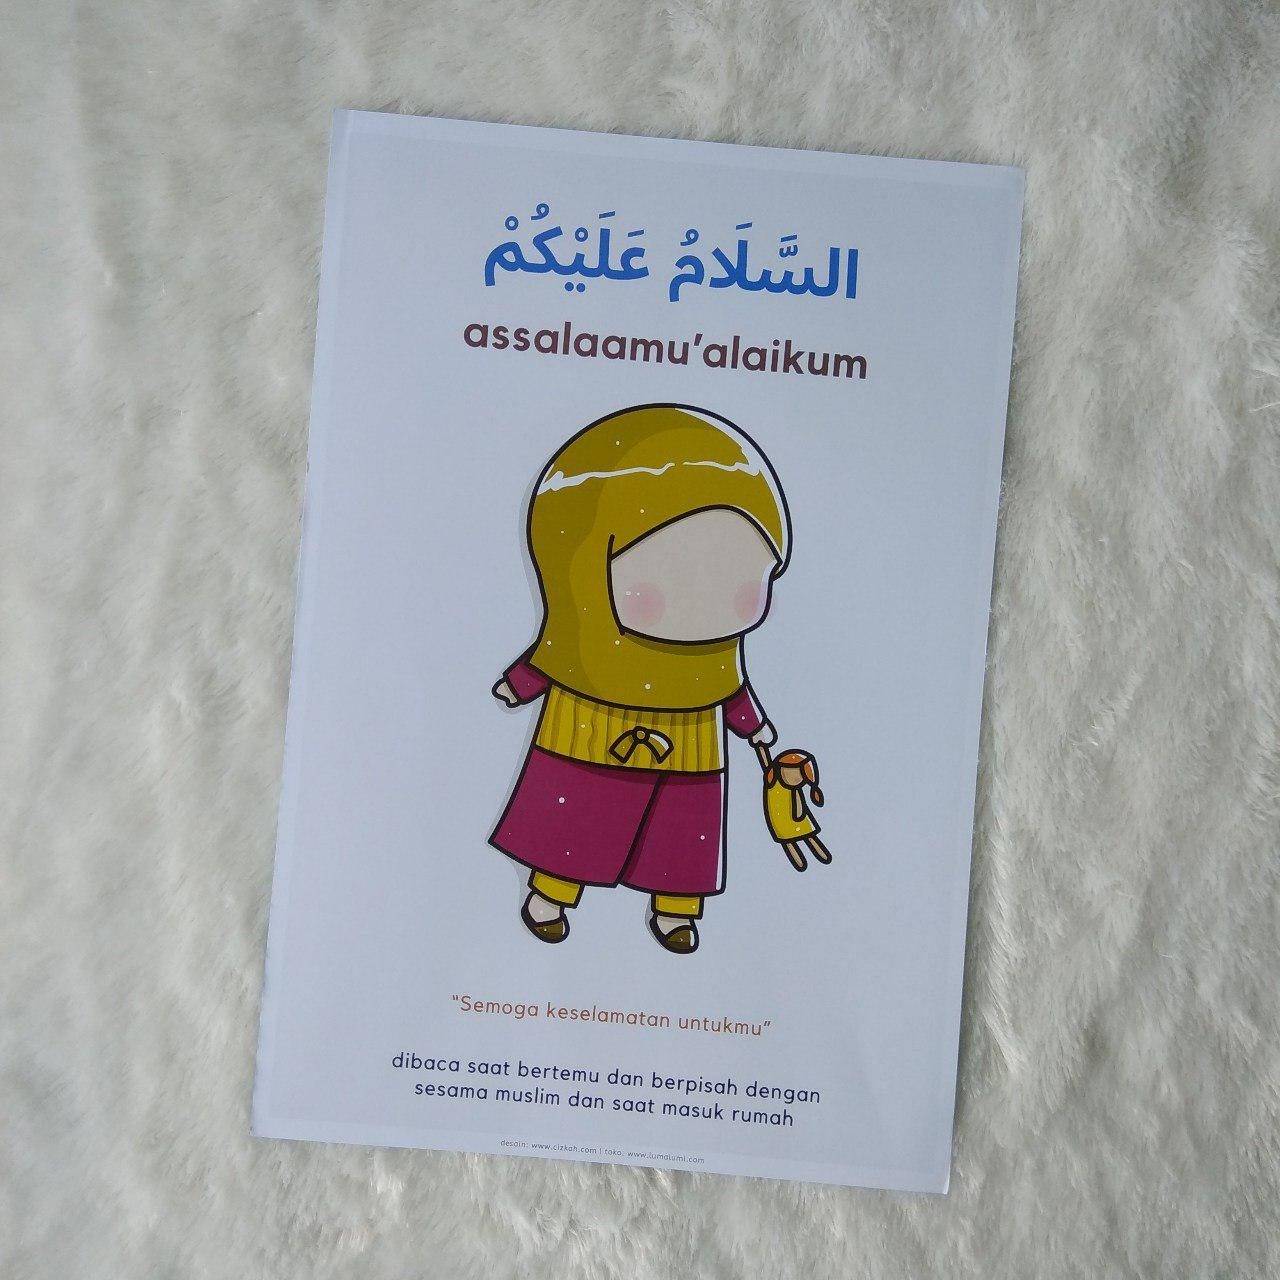 Poster Anak Salam Assalamu Alaikum - Assalaamu Alaikum